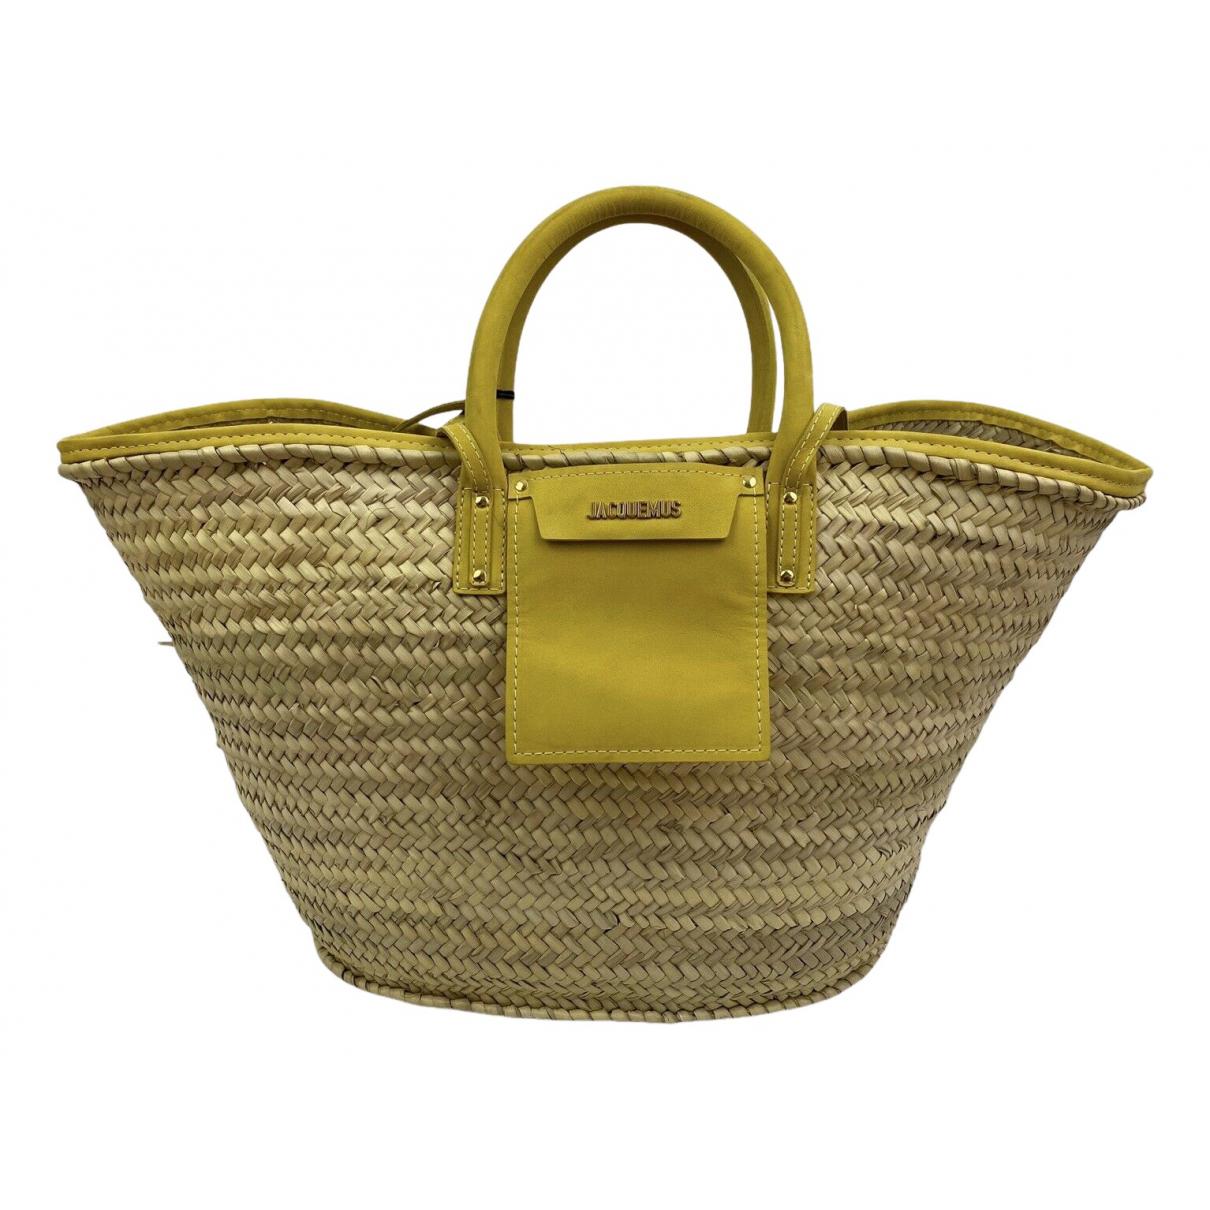 Jacquemus Le Grand Panier Beige Wicker handbag for Women N